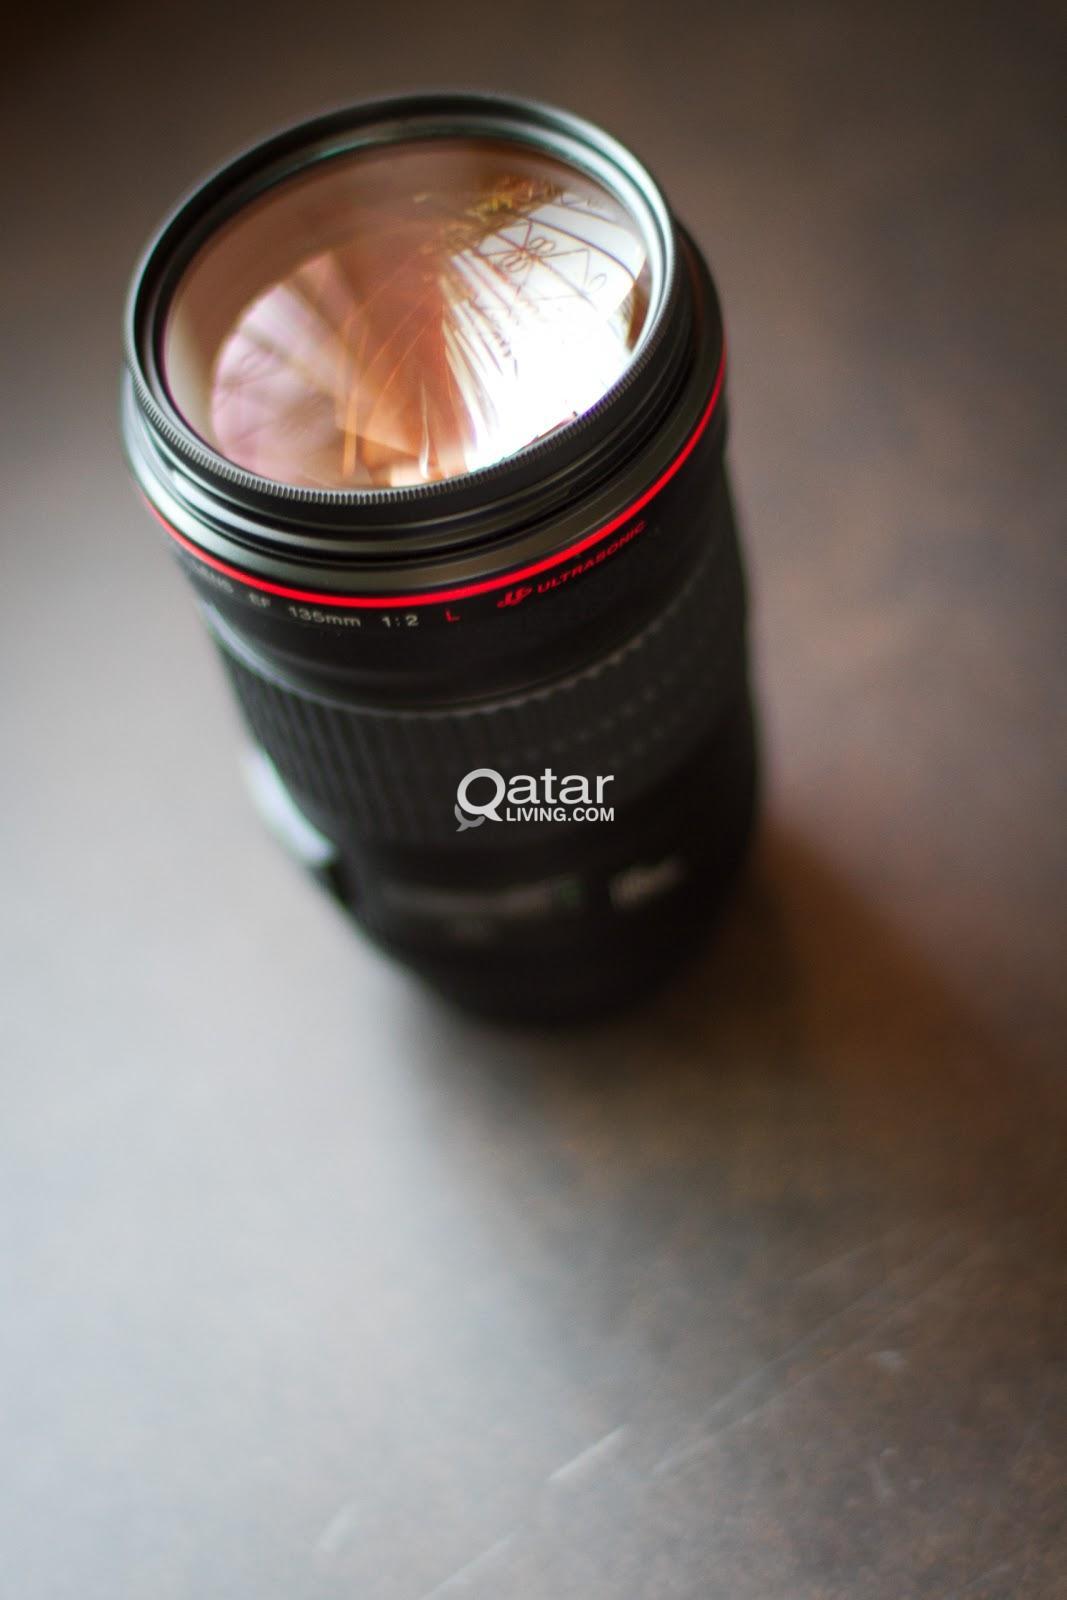 Canon 135mm f2 L lens | Qatar Living